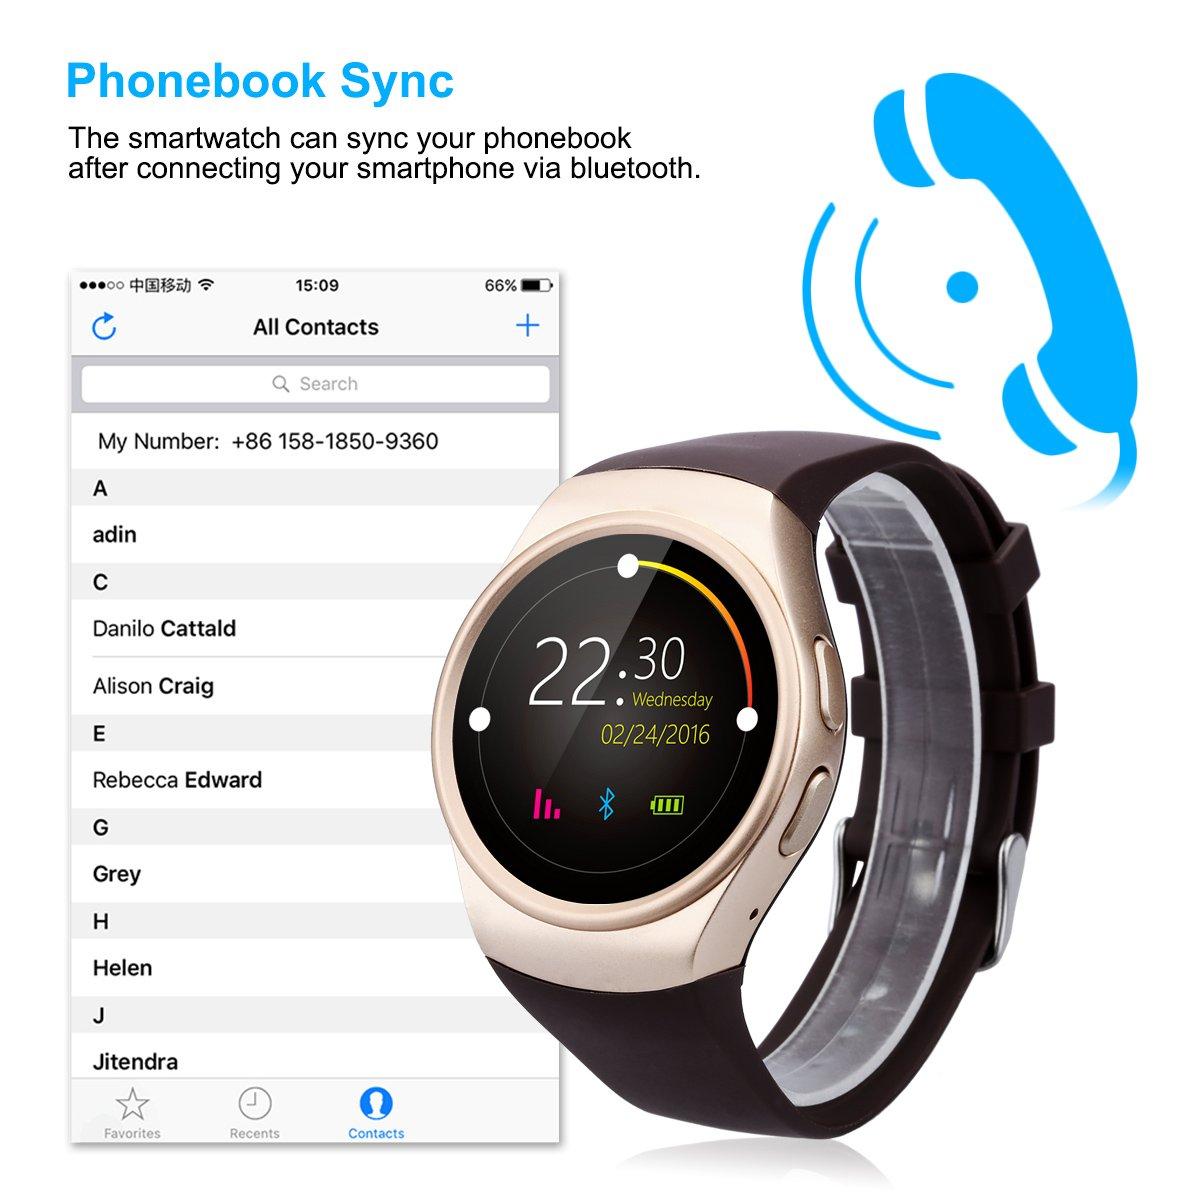 Excelvan KW18 - 4G Ajustable Smartwatch Smartphone Reloj Android iOS (Pantalla 1.3, 4G micro SIM, Bluetooth 4.0, Ritmo Cardíaco, Podómetro, Monitor ...